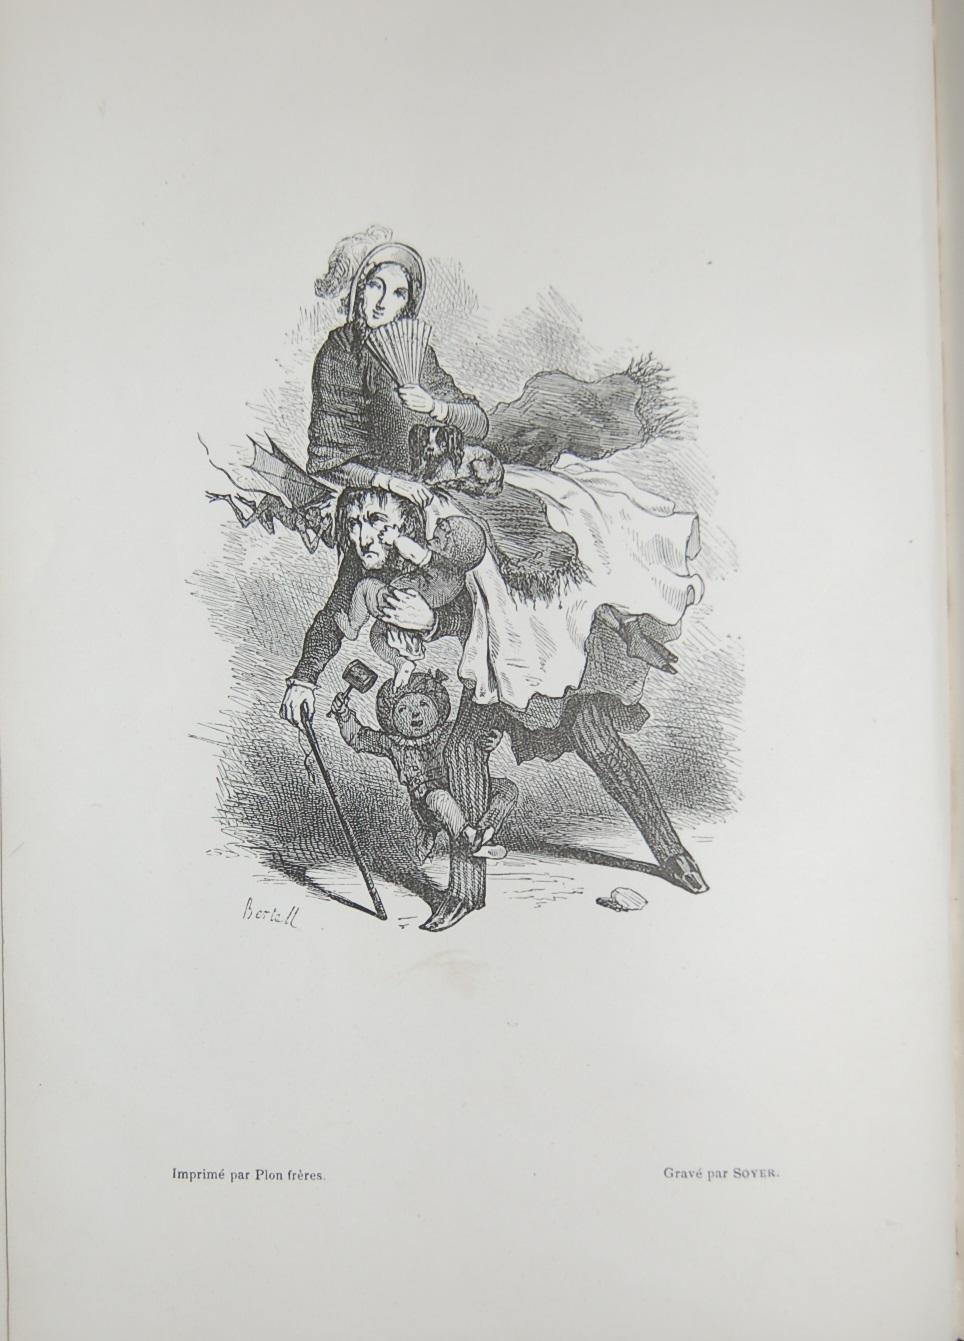 Bertall, frontsipice de l'édition originale